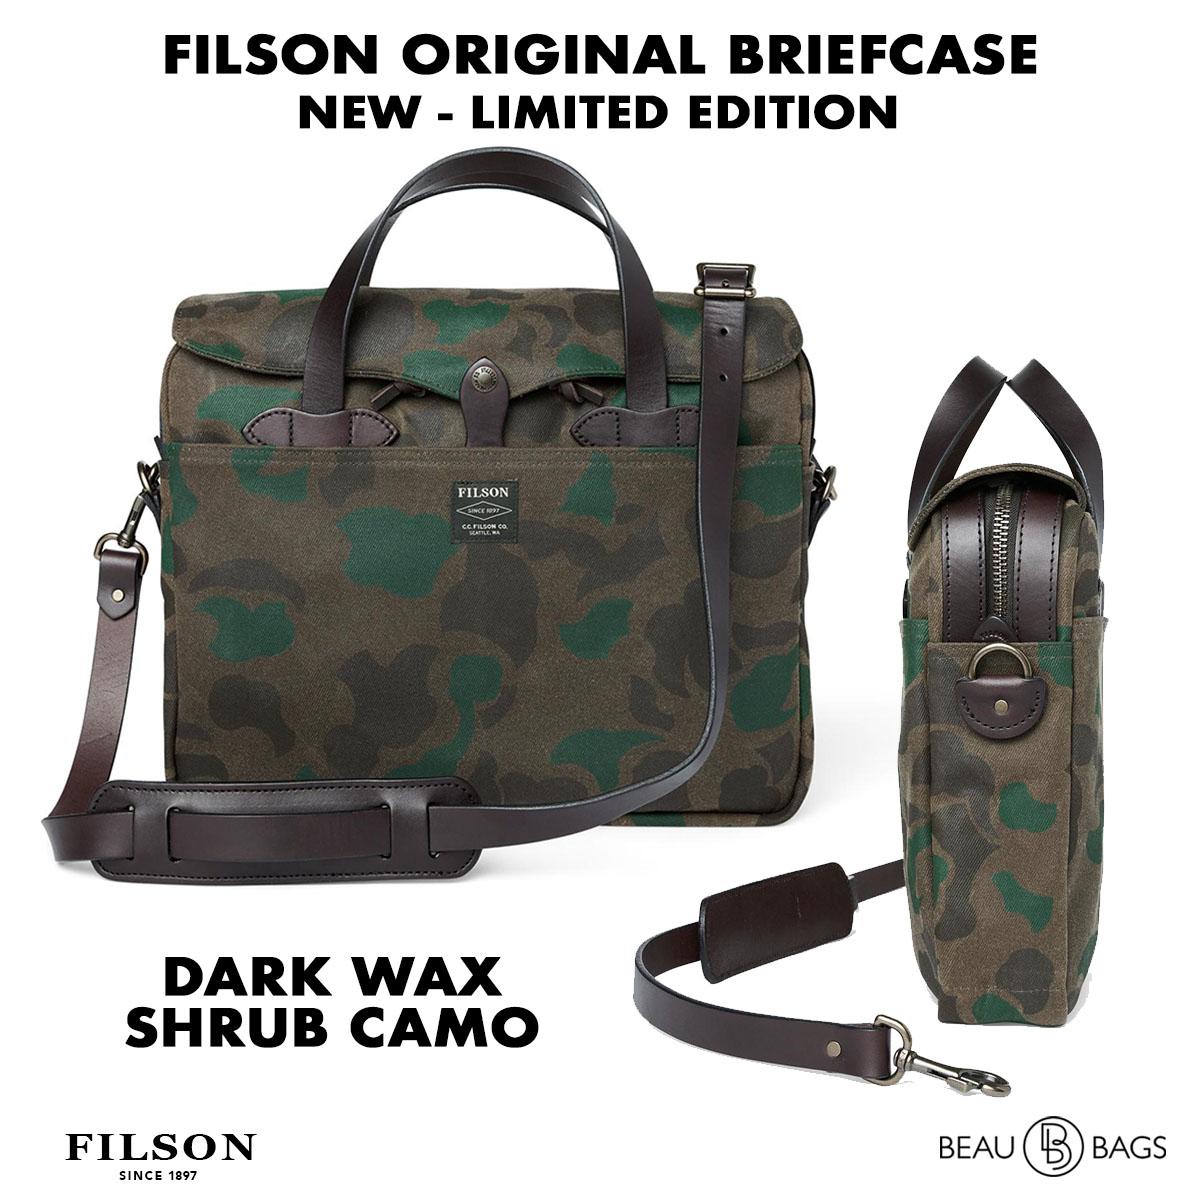 Filson Waxed Rugged Twill Original Briefcase 20226928-Dark Wax Shrub Camo, limitierte Camo Auflage